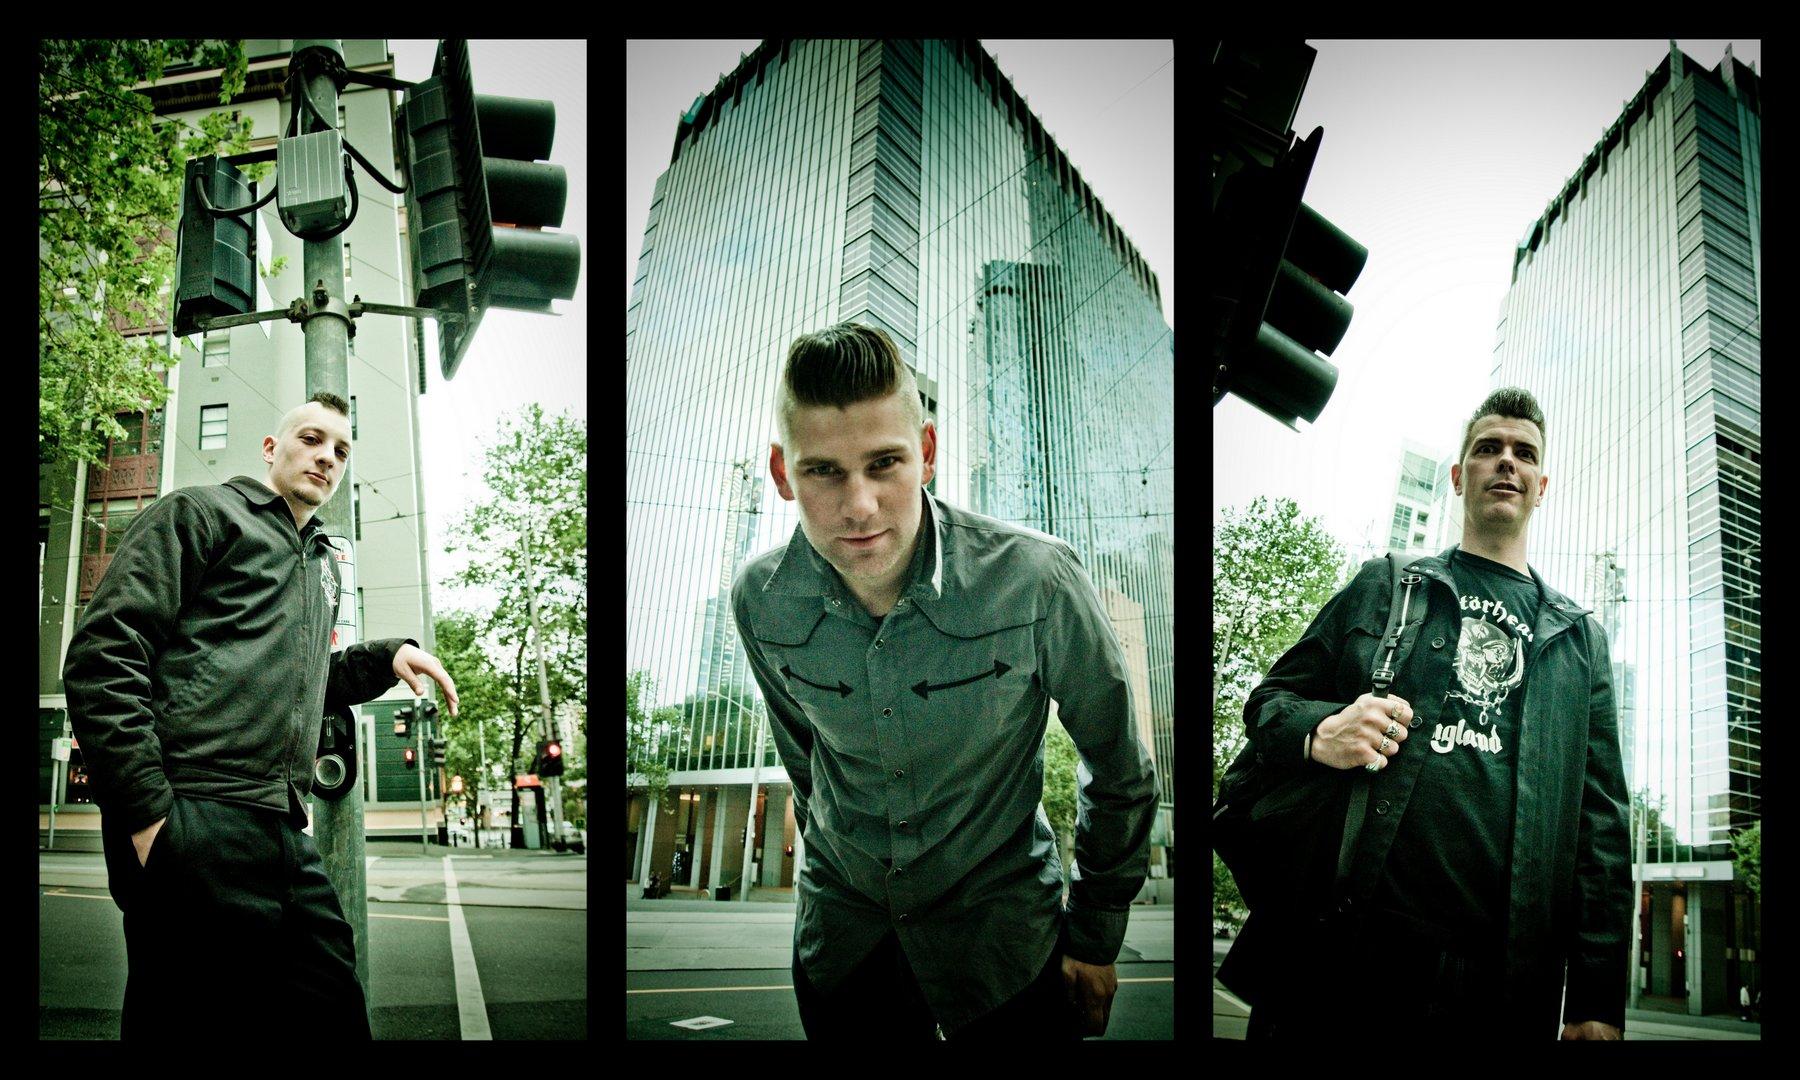 doubleblack city shoot.jpg